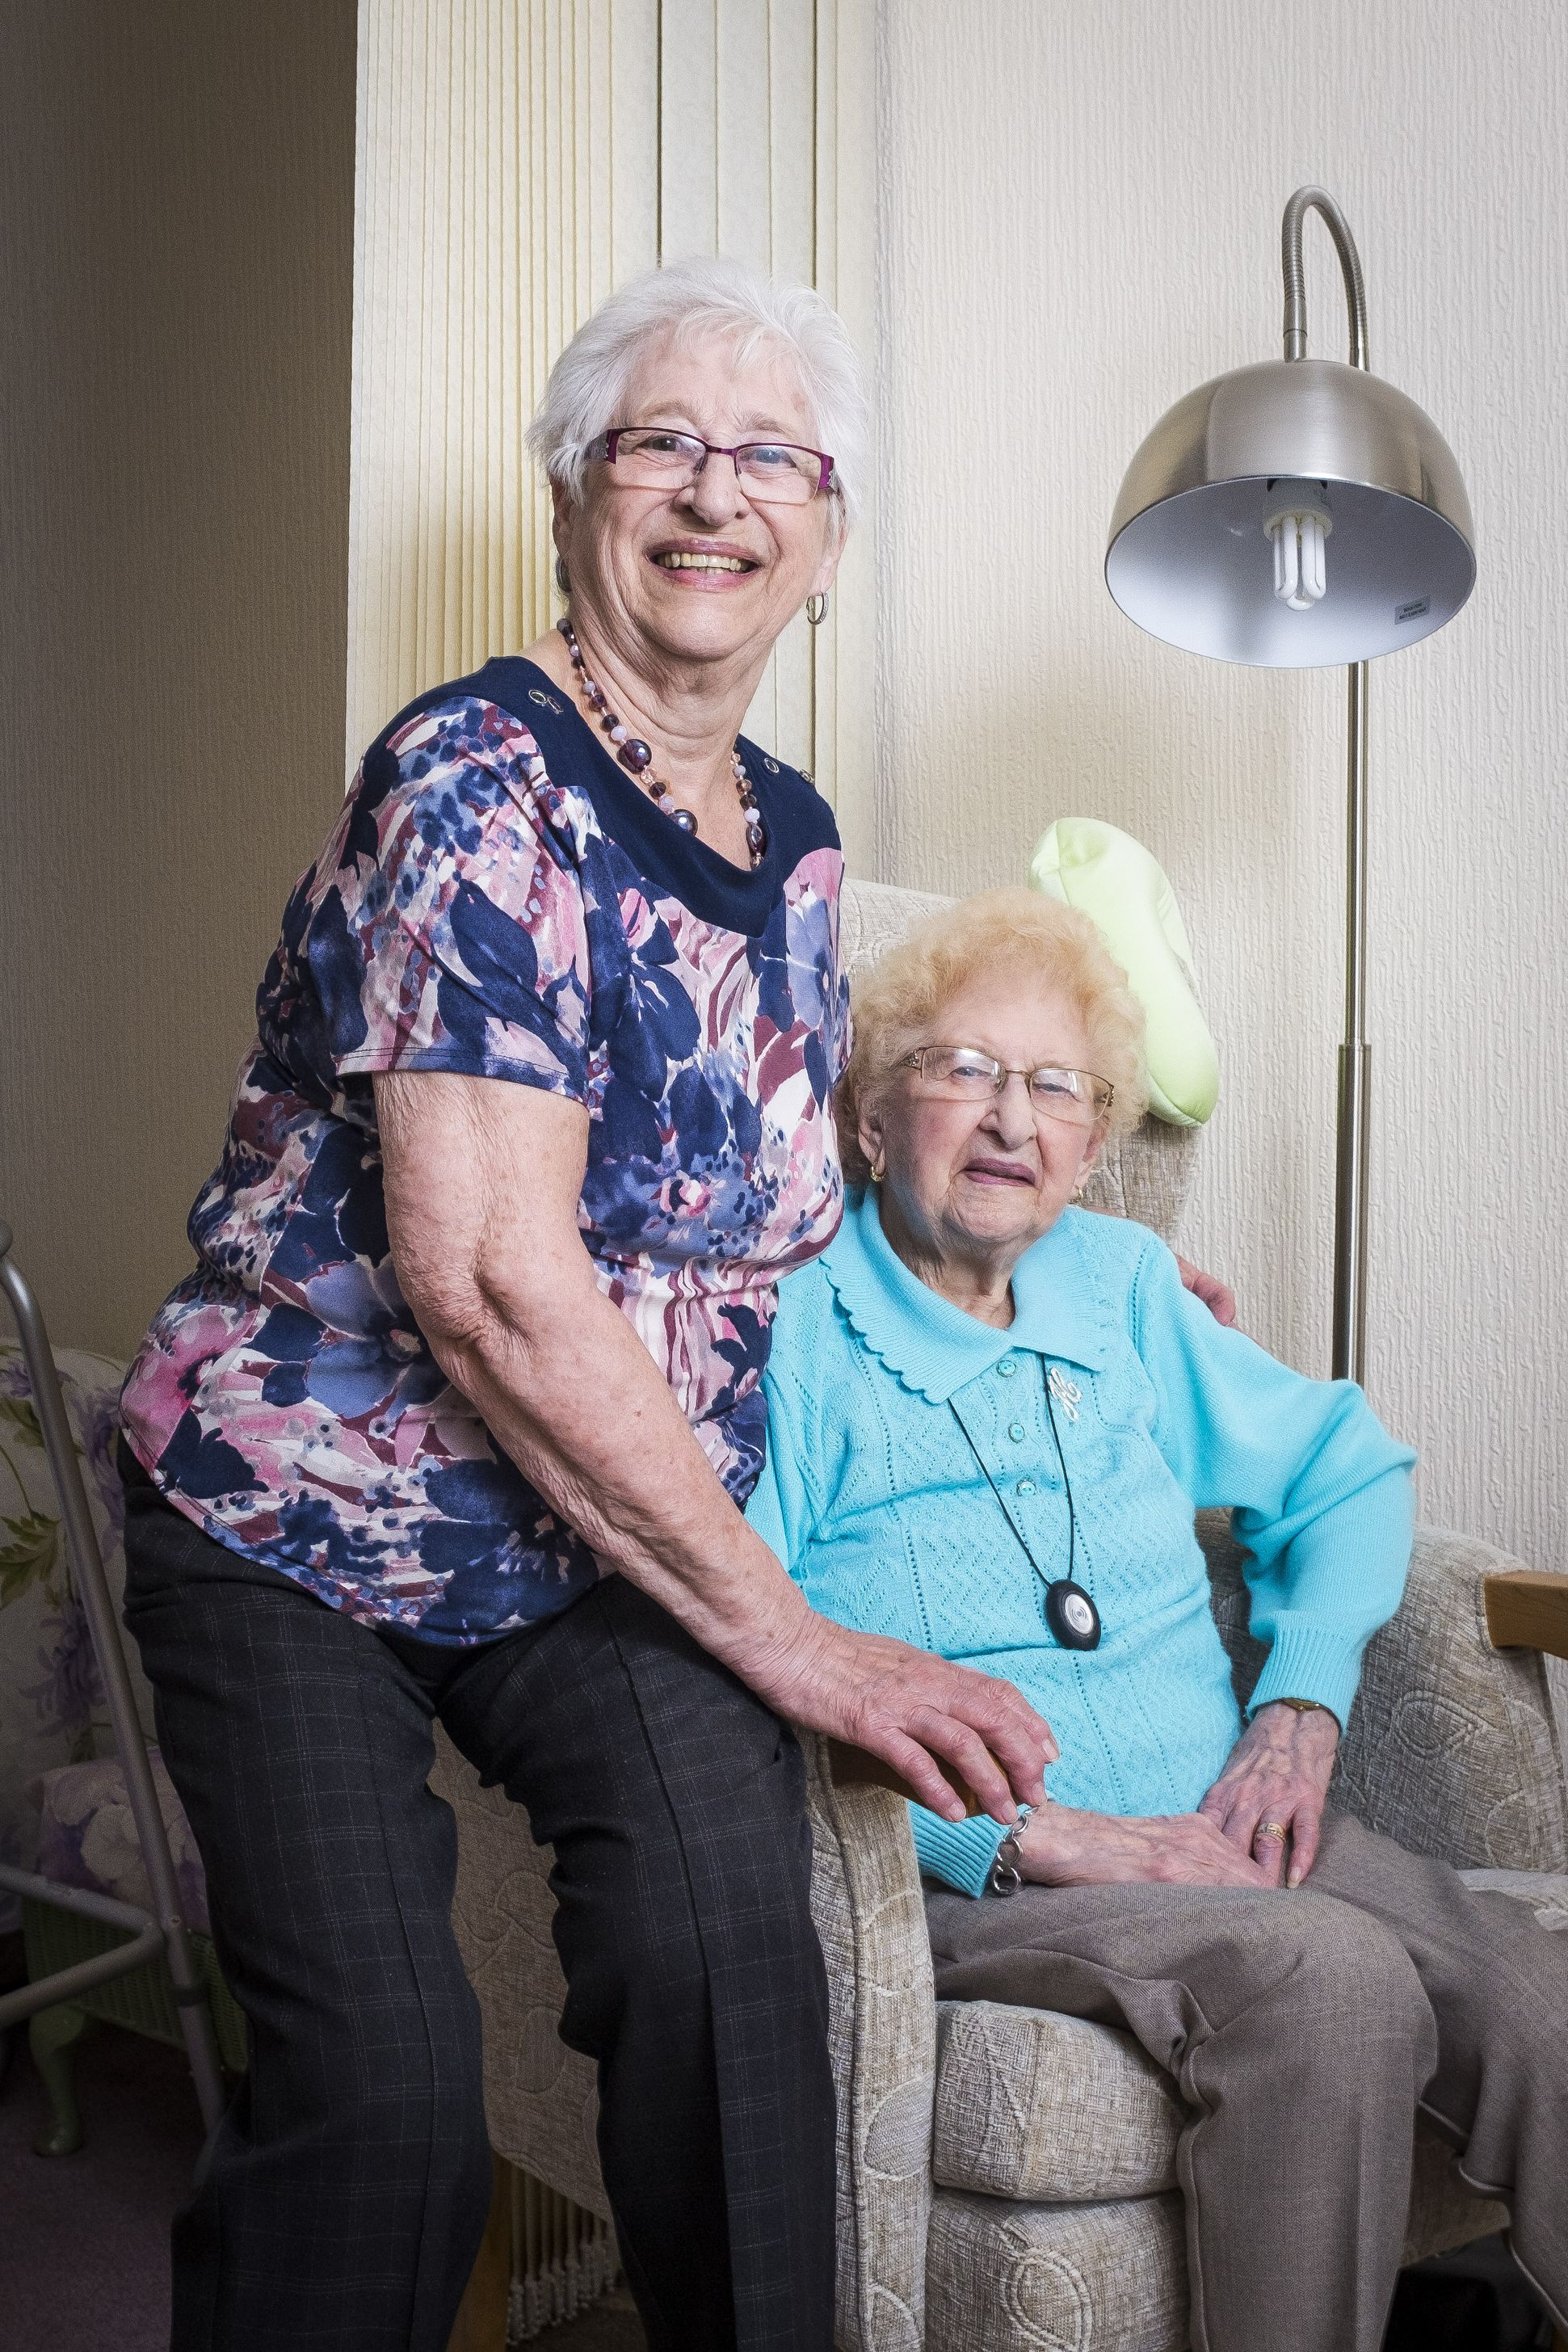 Thelma Foxhall and Hilda Hammock